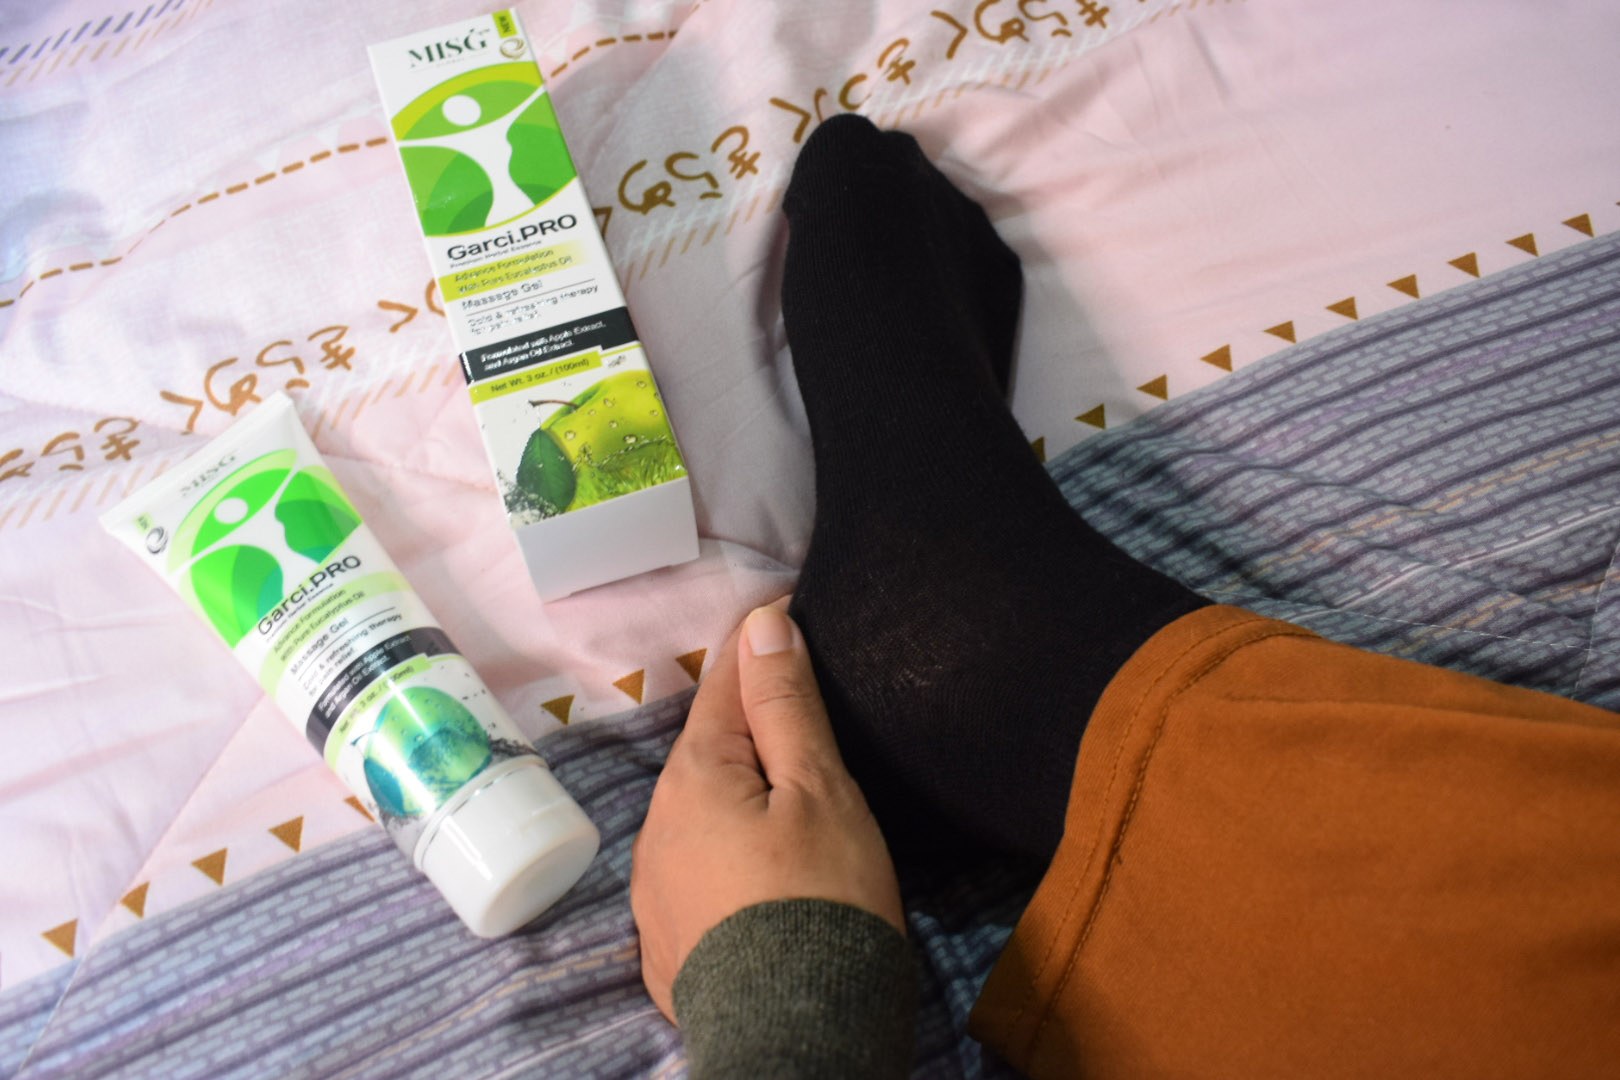 Garci Pro gel Kurangkan Rasa kebas, Sakit Lutut dan Legakan Sakit Sendi